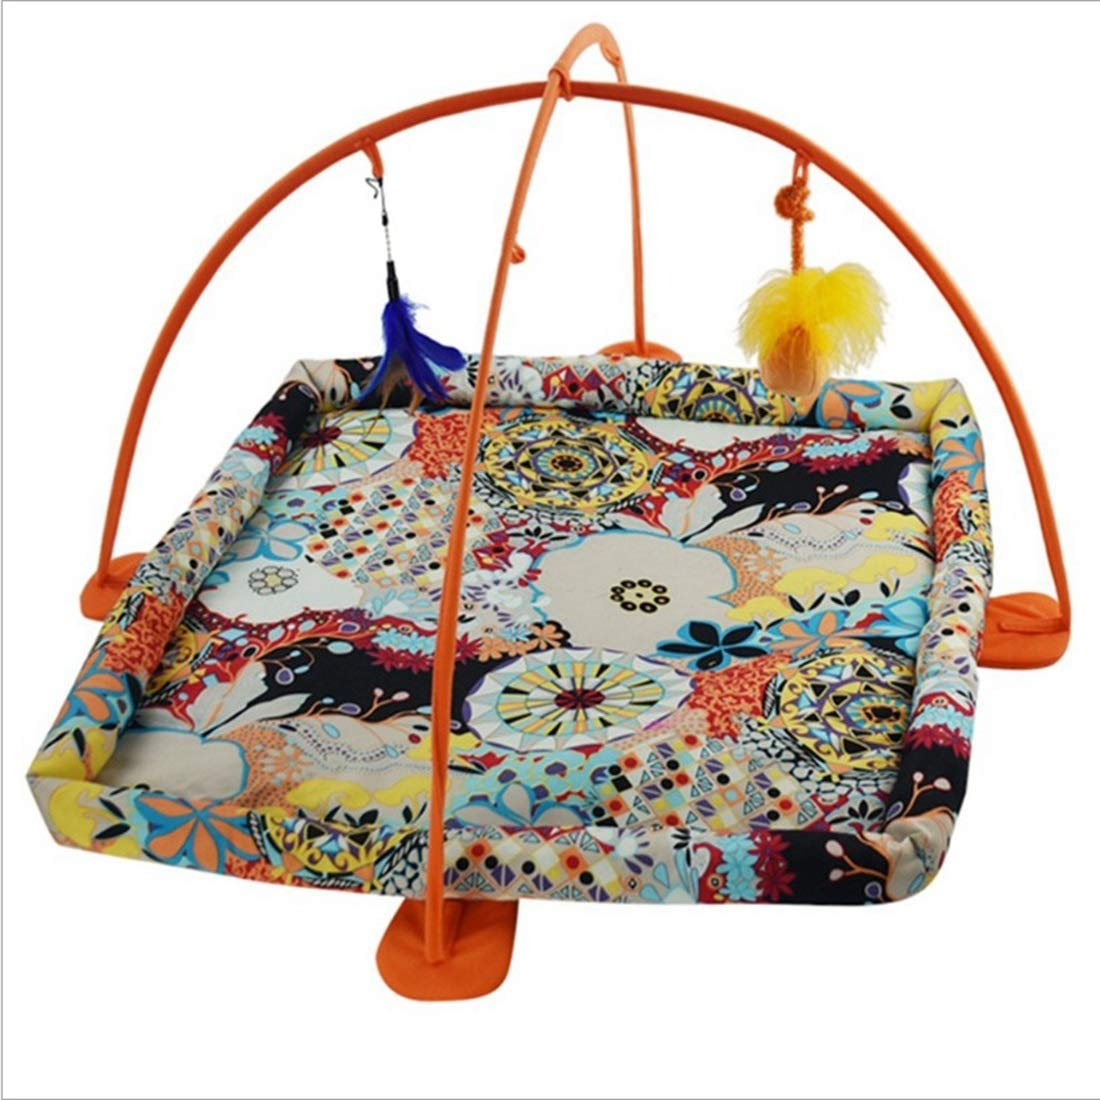 Yanhui YH Cat Tent Pet Toy Cat Hammock Toy (Color : Orange) by Yanhui